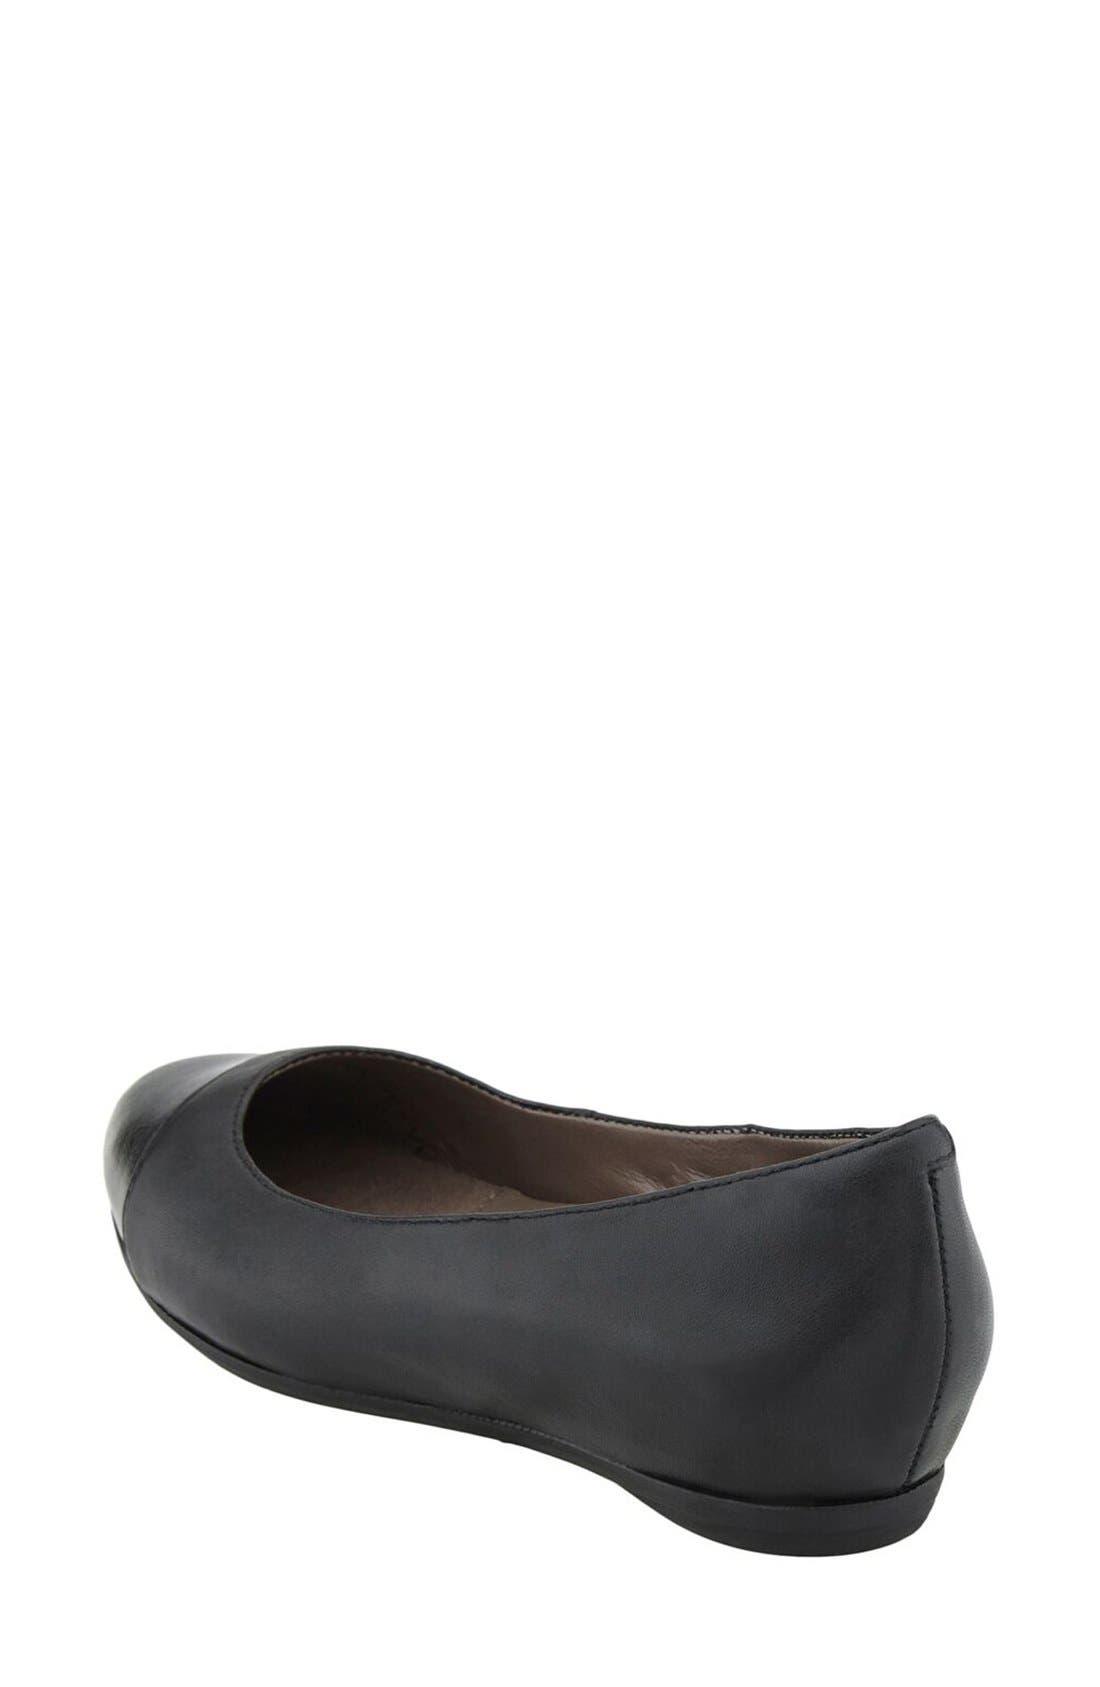 'Hanover' Cap Toe Flat,                             Alternate thumbnail 2, color,                             Black Leather